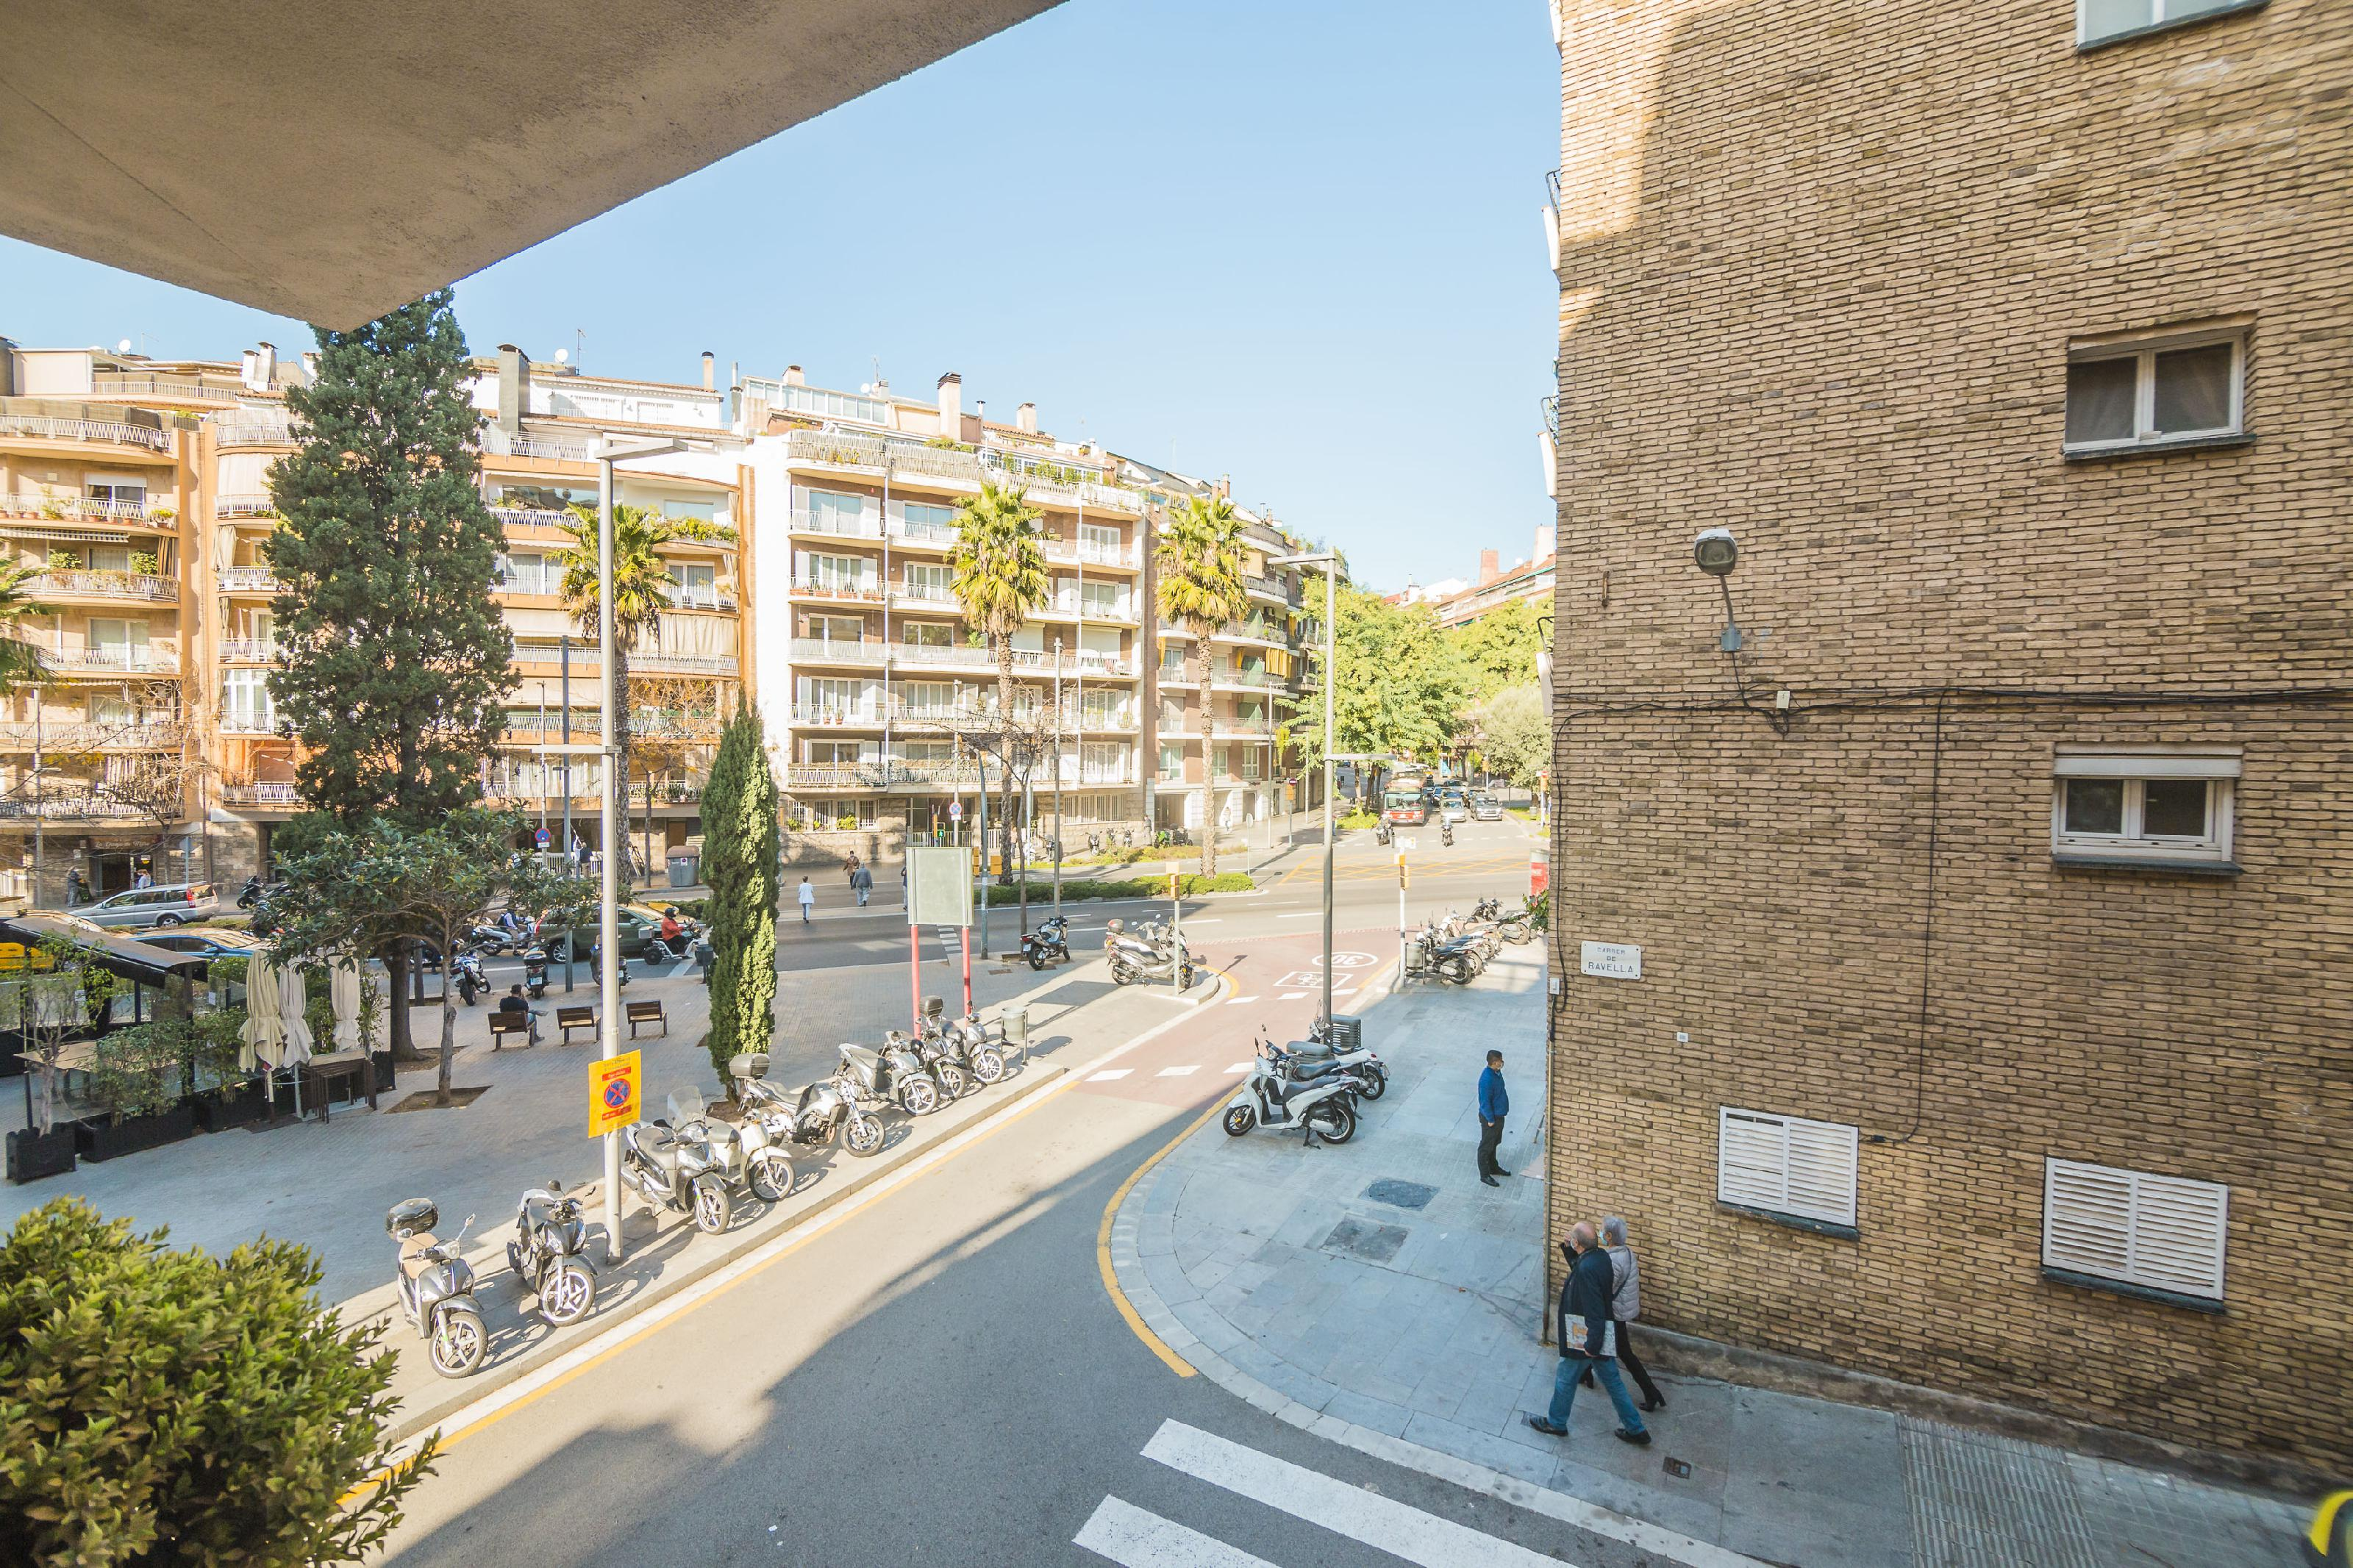 244392 Flat for sale in Sarrià-Sant Gervasi, Sant Gervasi-Galvany 35